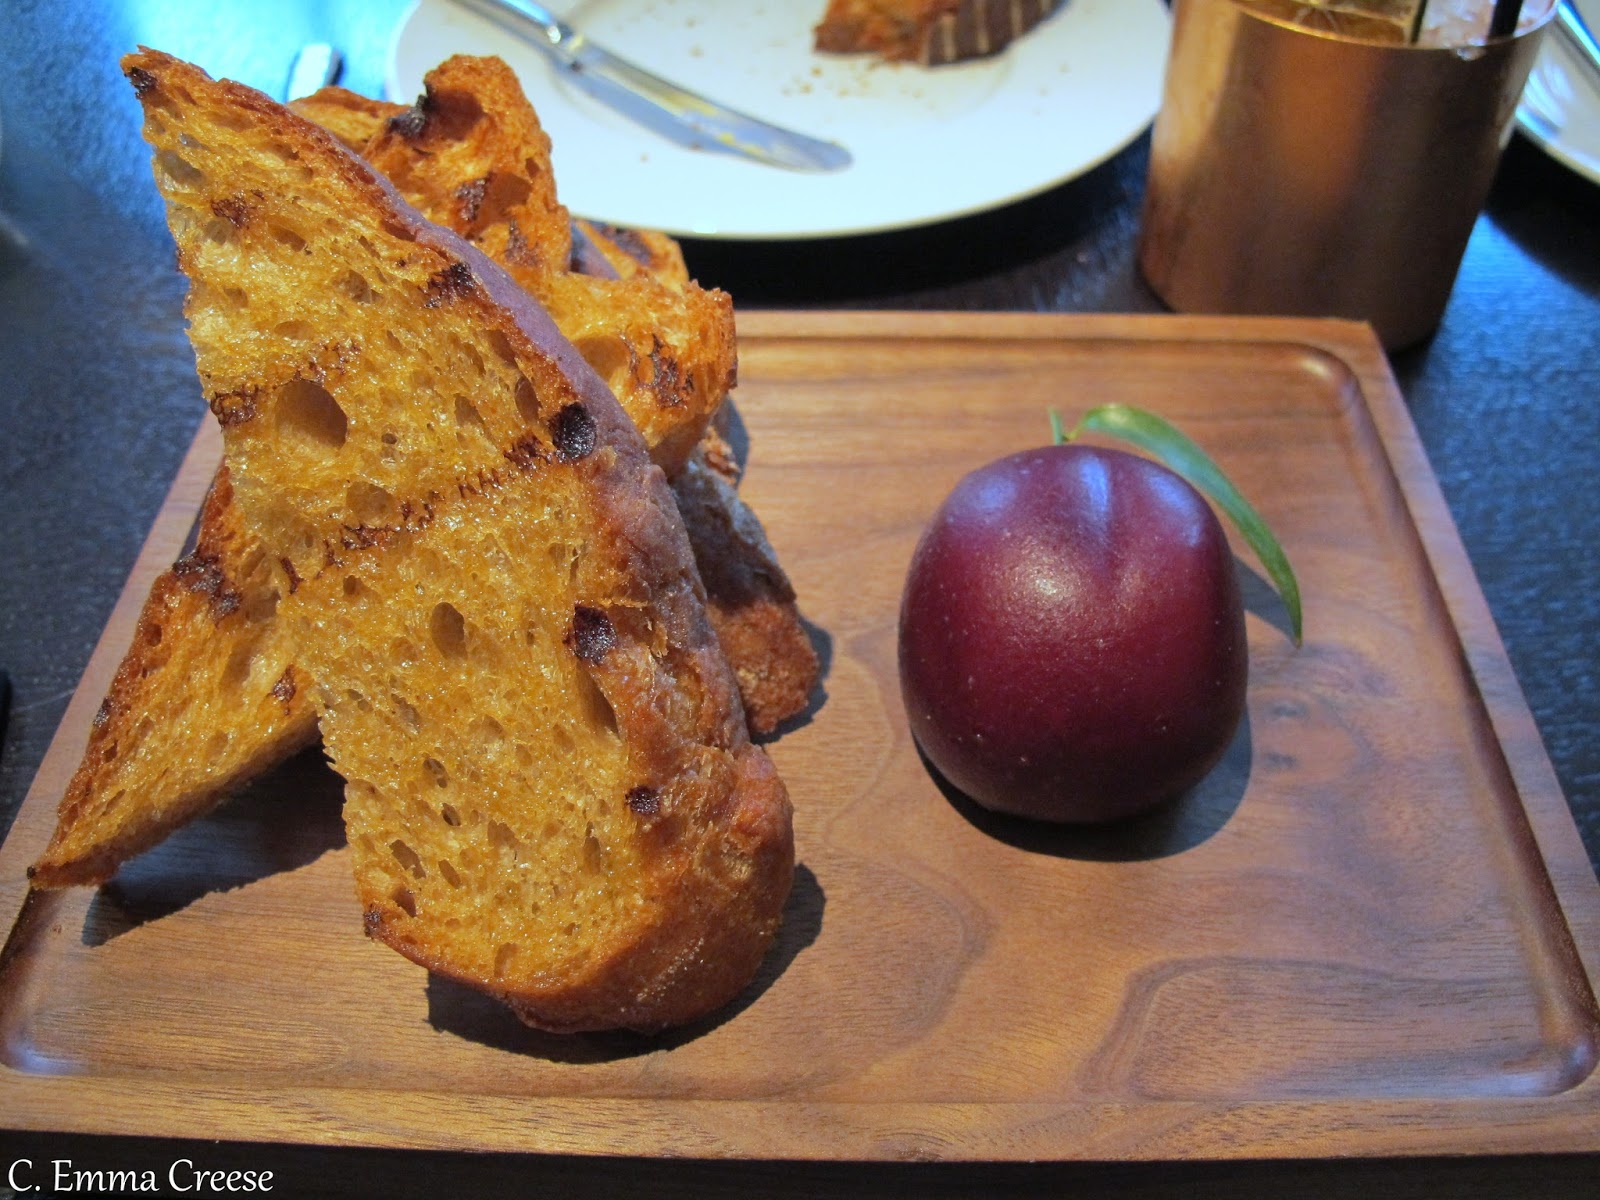 Heston Blumenthal Mandarin Oriental Hyde Park Luxury Gastronomy Dinner Adventures of a London Kiwi